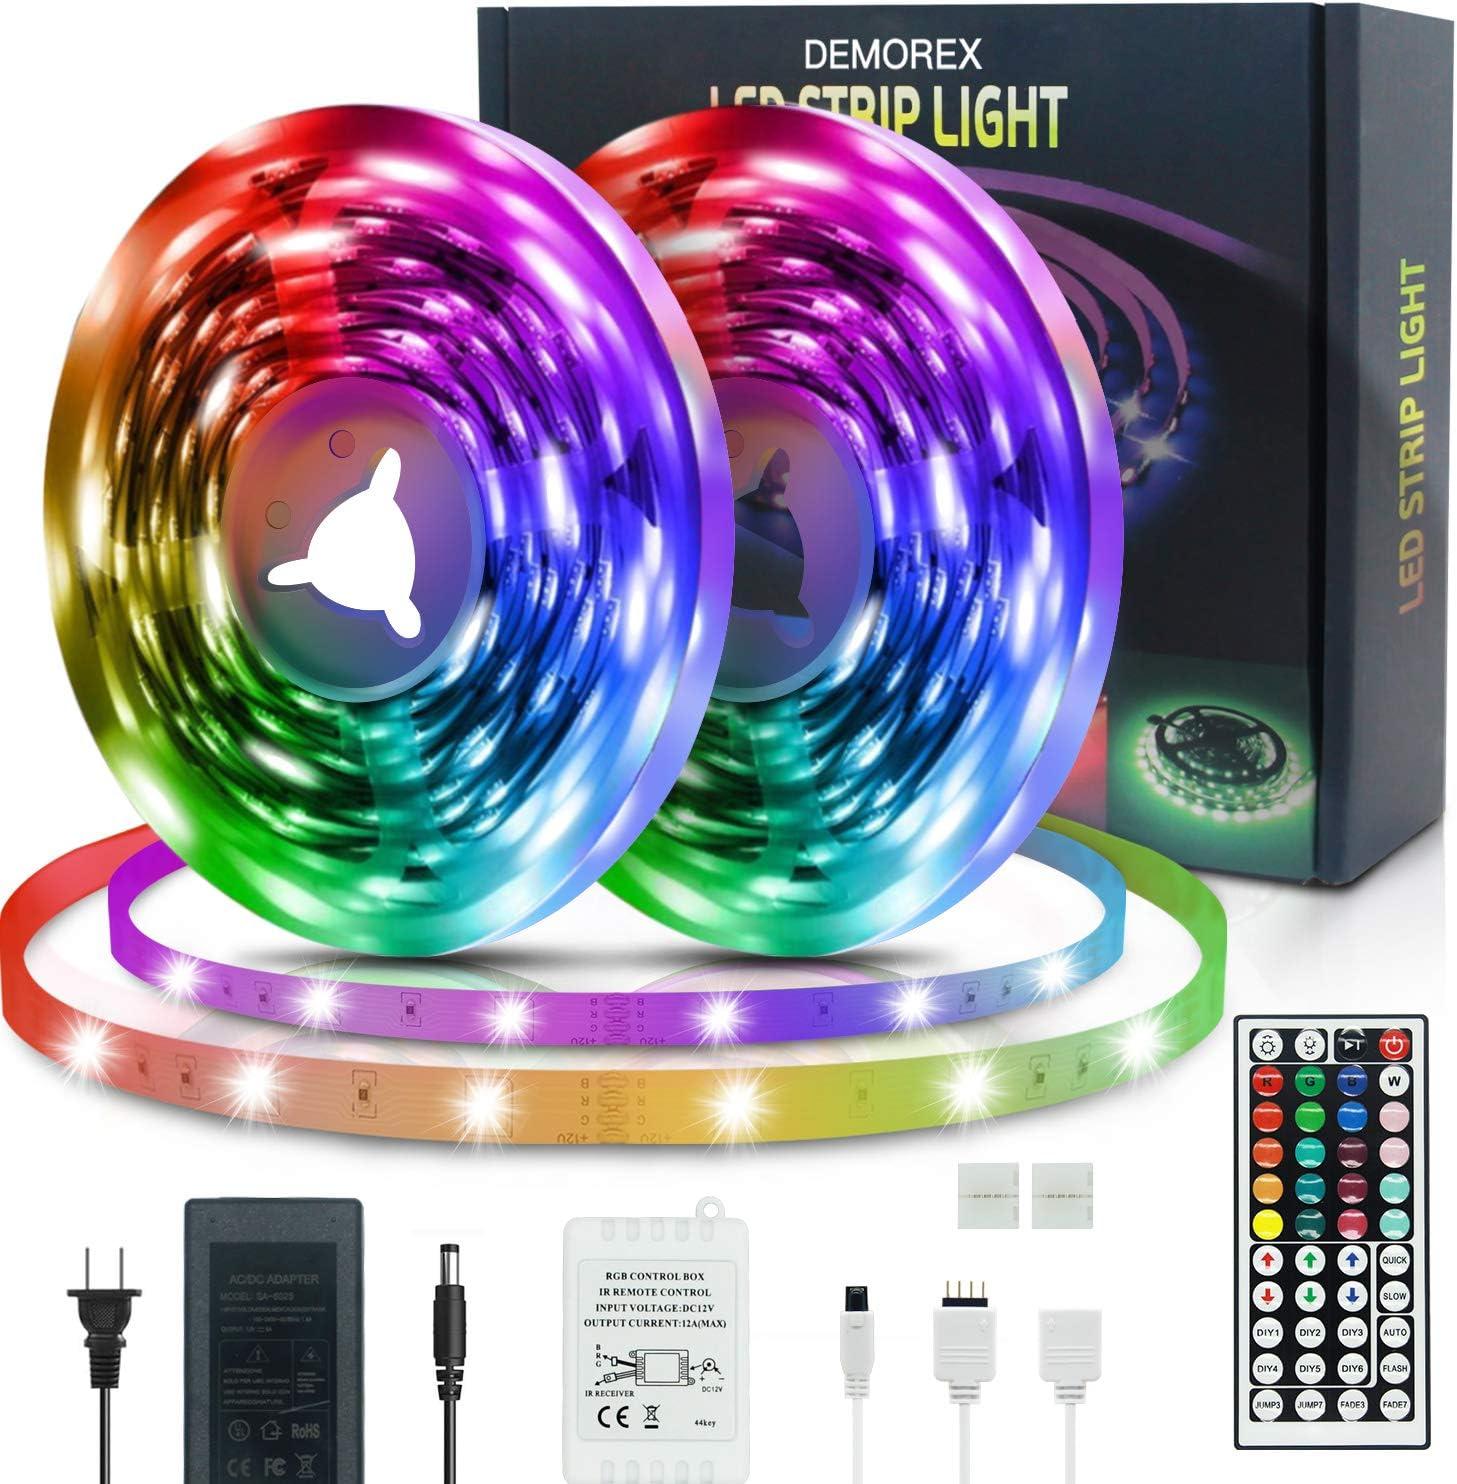 LED Strip Lights Demorex 50ft Finally lowest price popular brand Color Changing 50 Rope